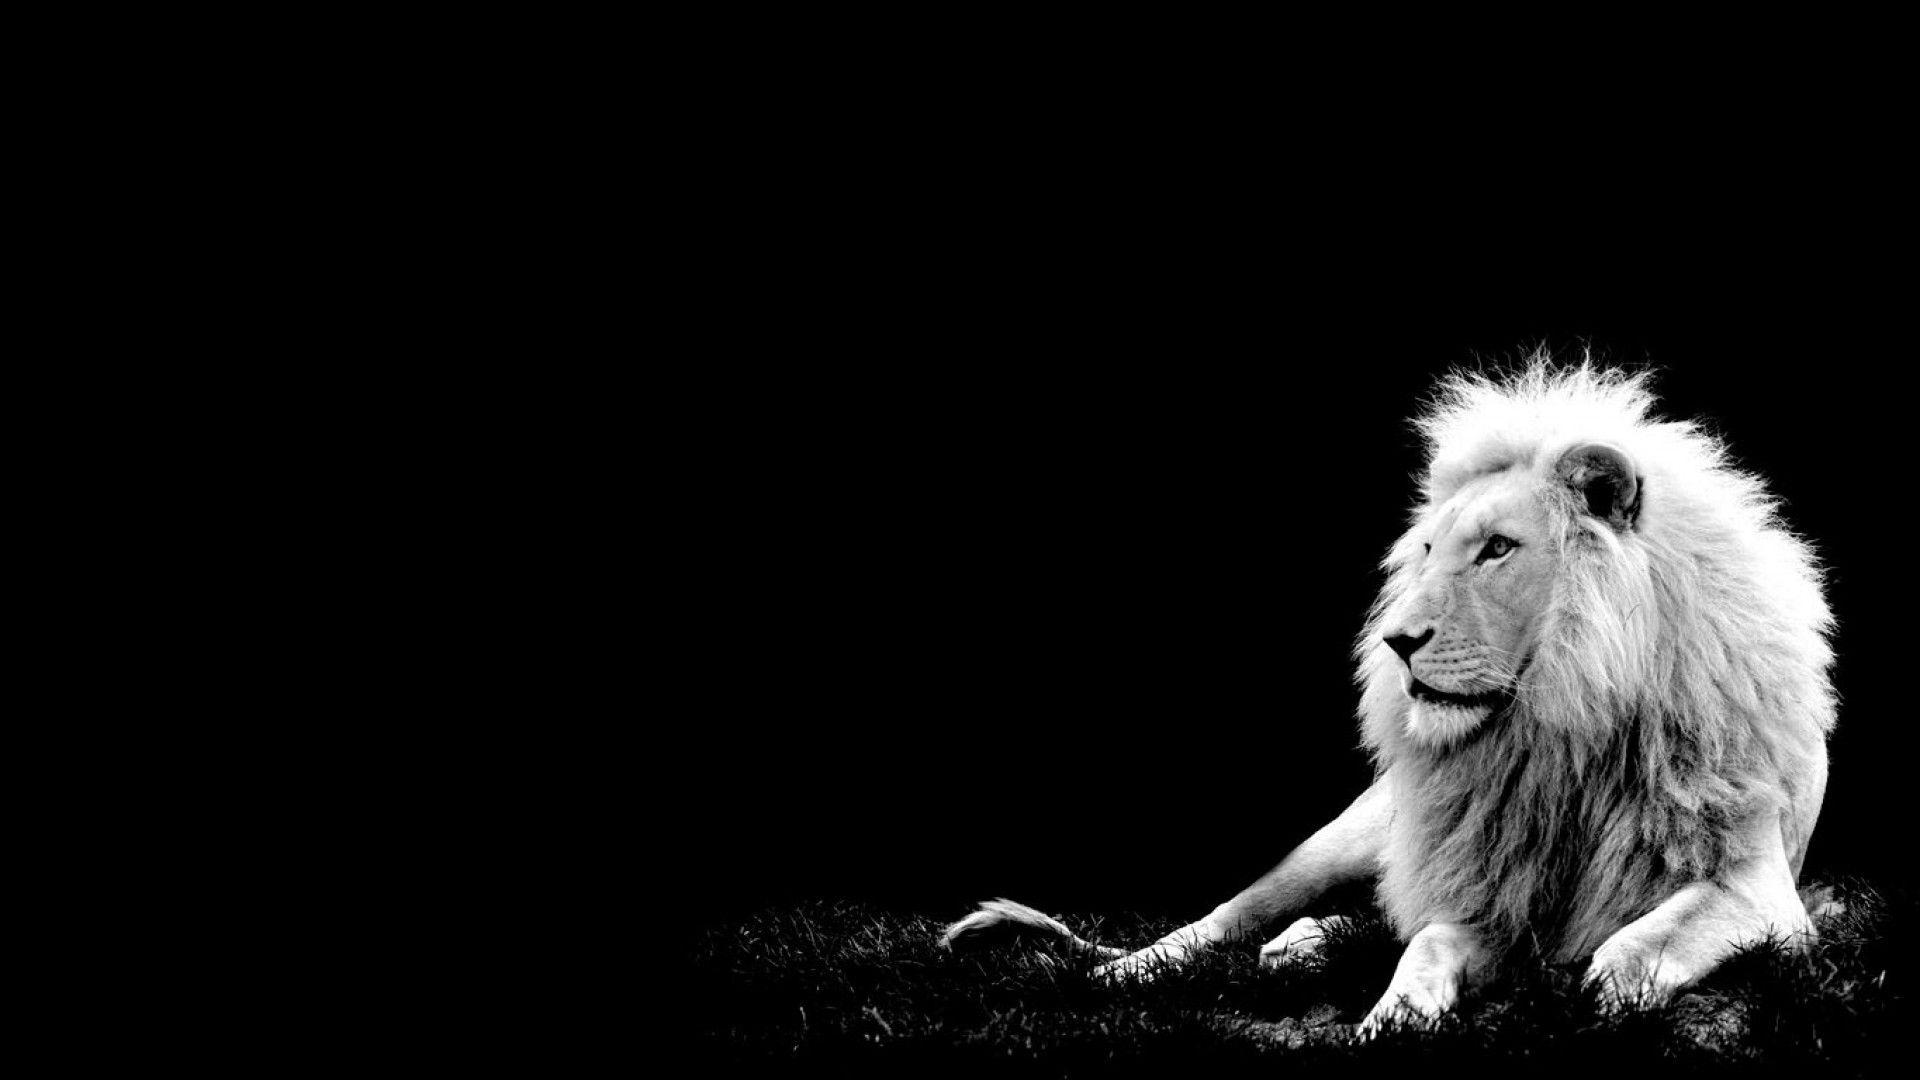 Lion Wallpaper Black And White Lion Wallpaper Lion Hd Wallpaper Lion Pictures